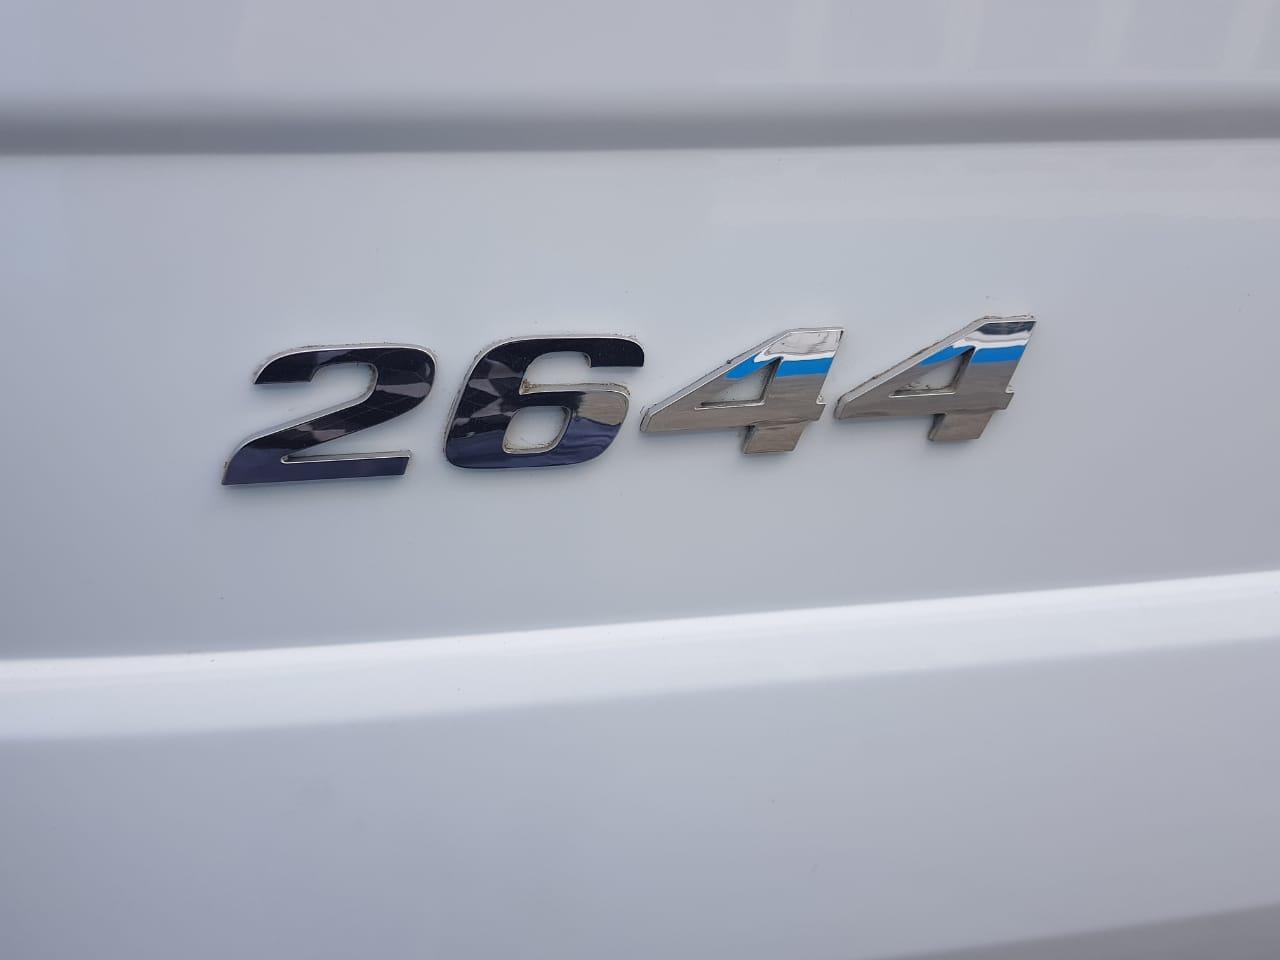 Merc Actros 2644 on sale